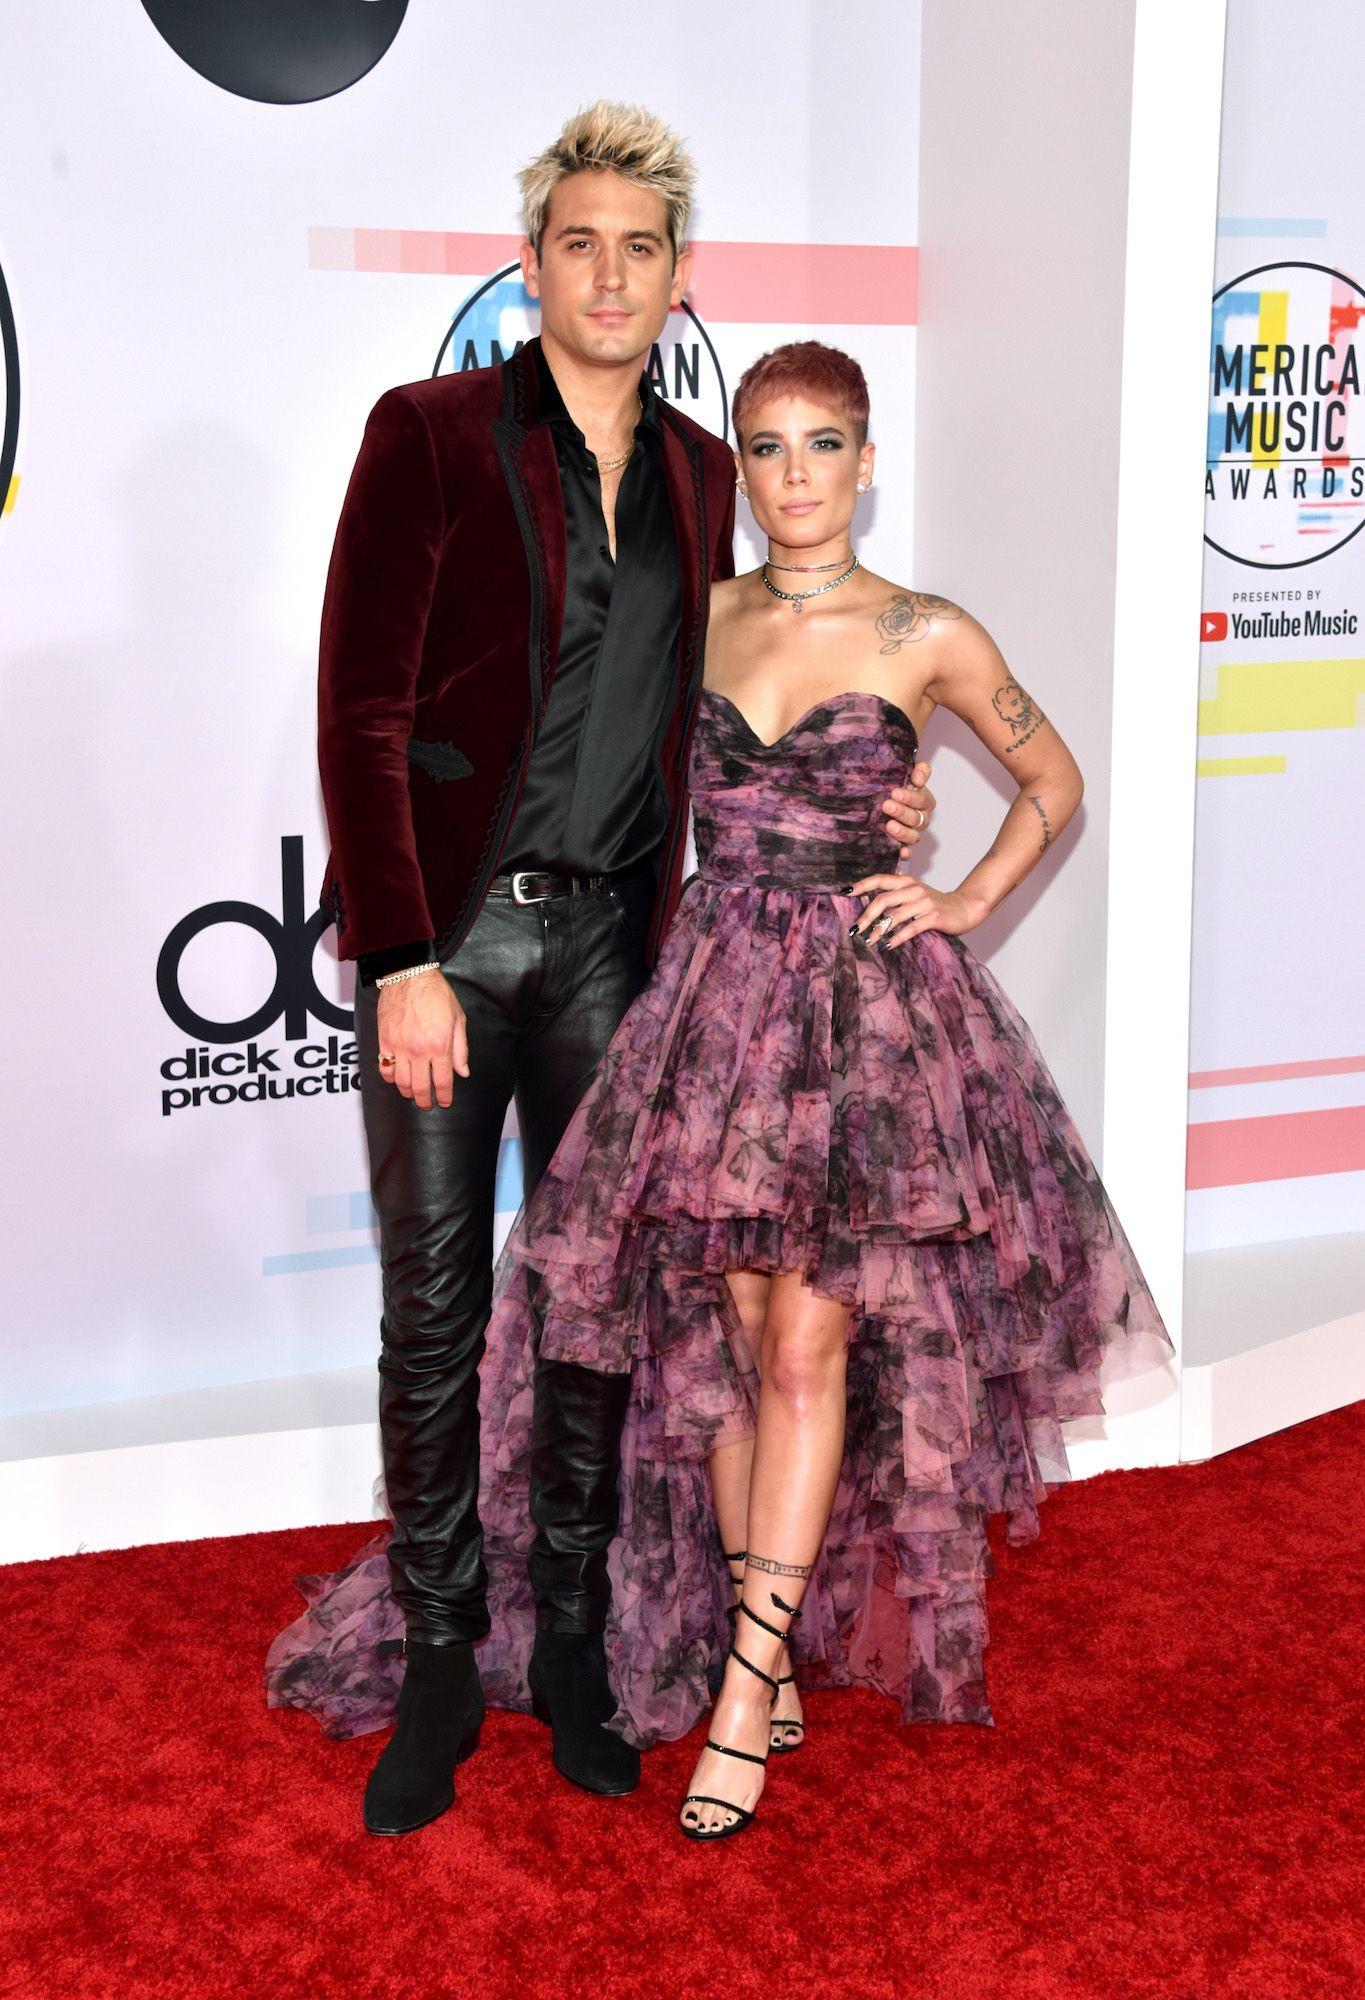 2018 American Music Awards Couples Halsey G-Eazy